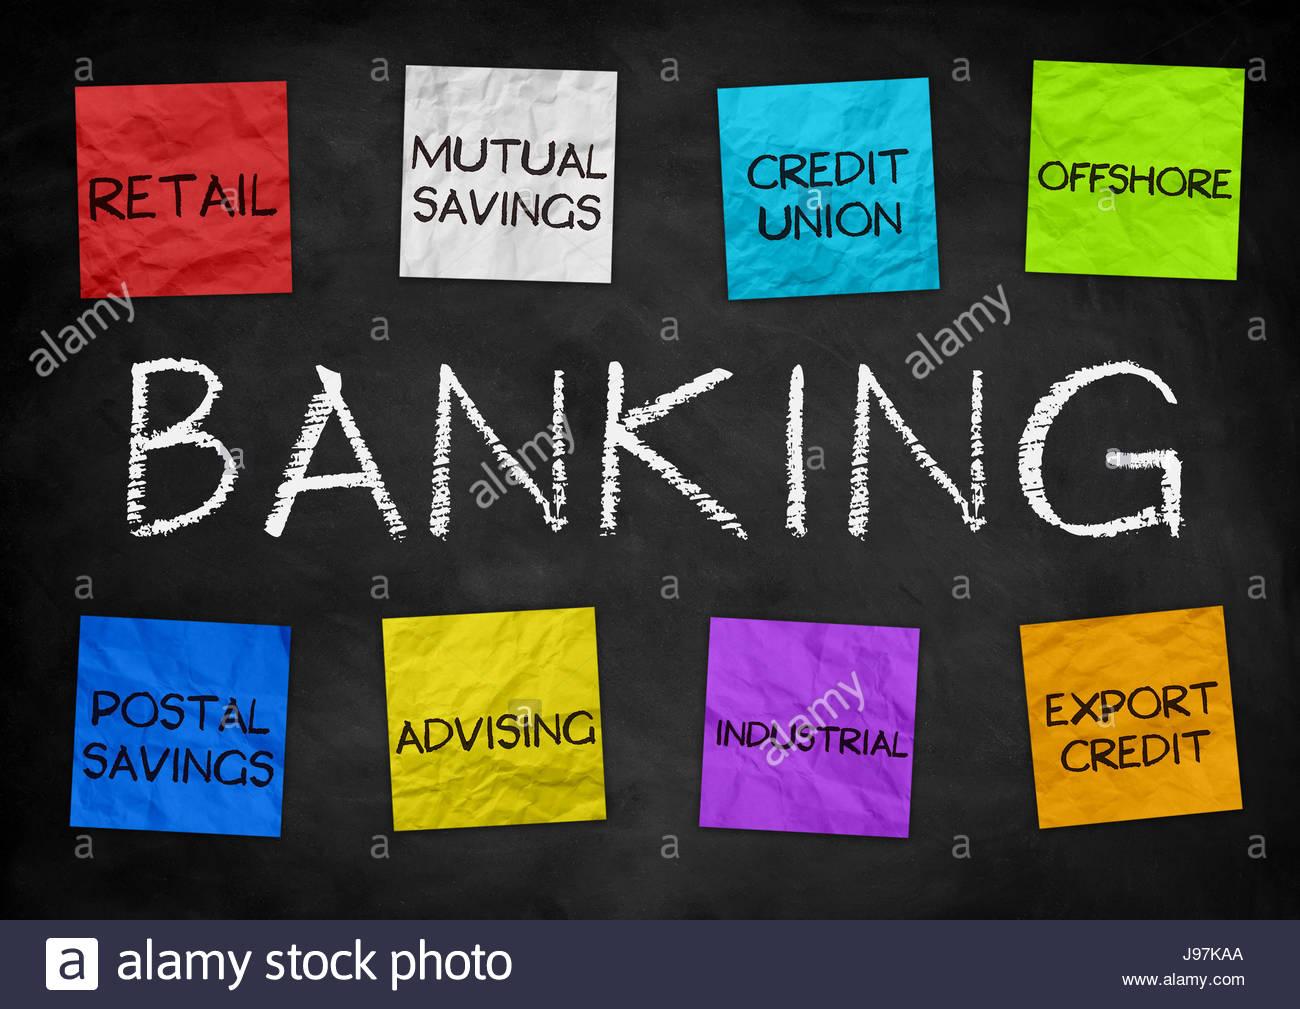 Banking strategies - Stock Image